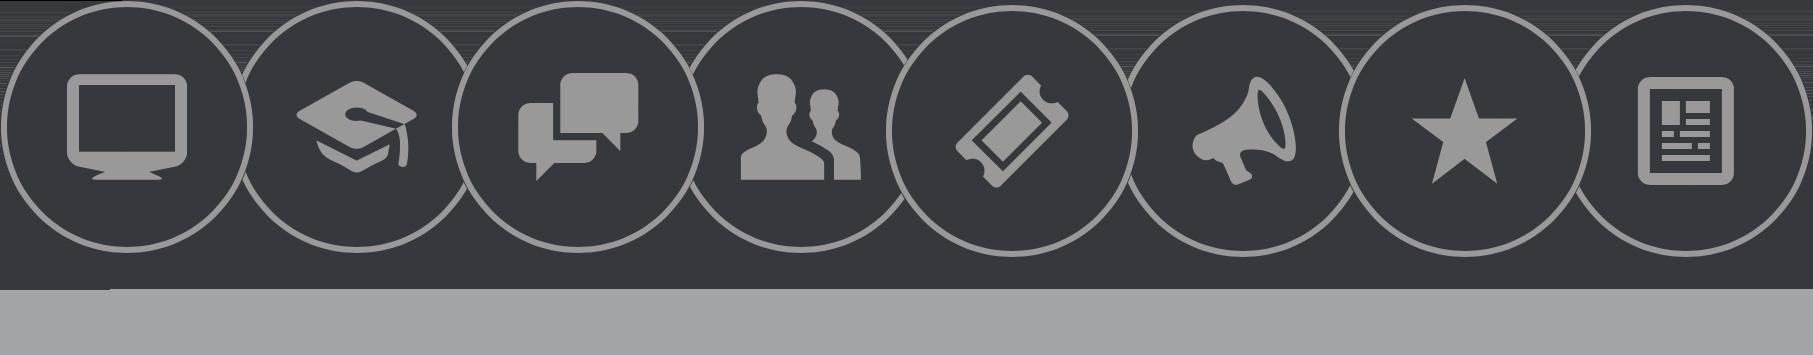 Game Academy Benefits